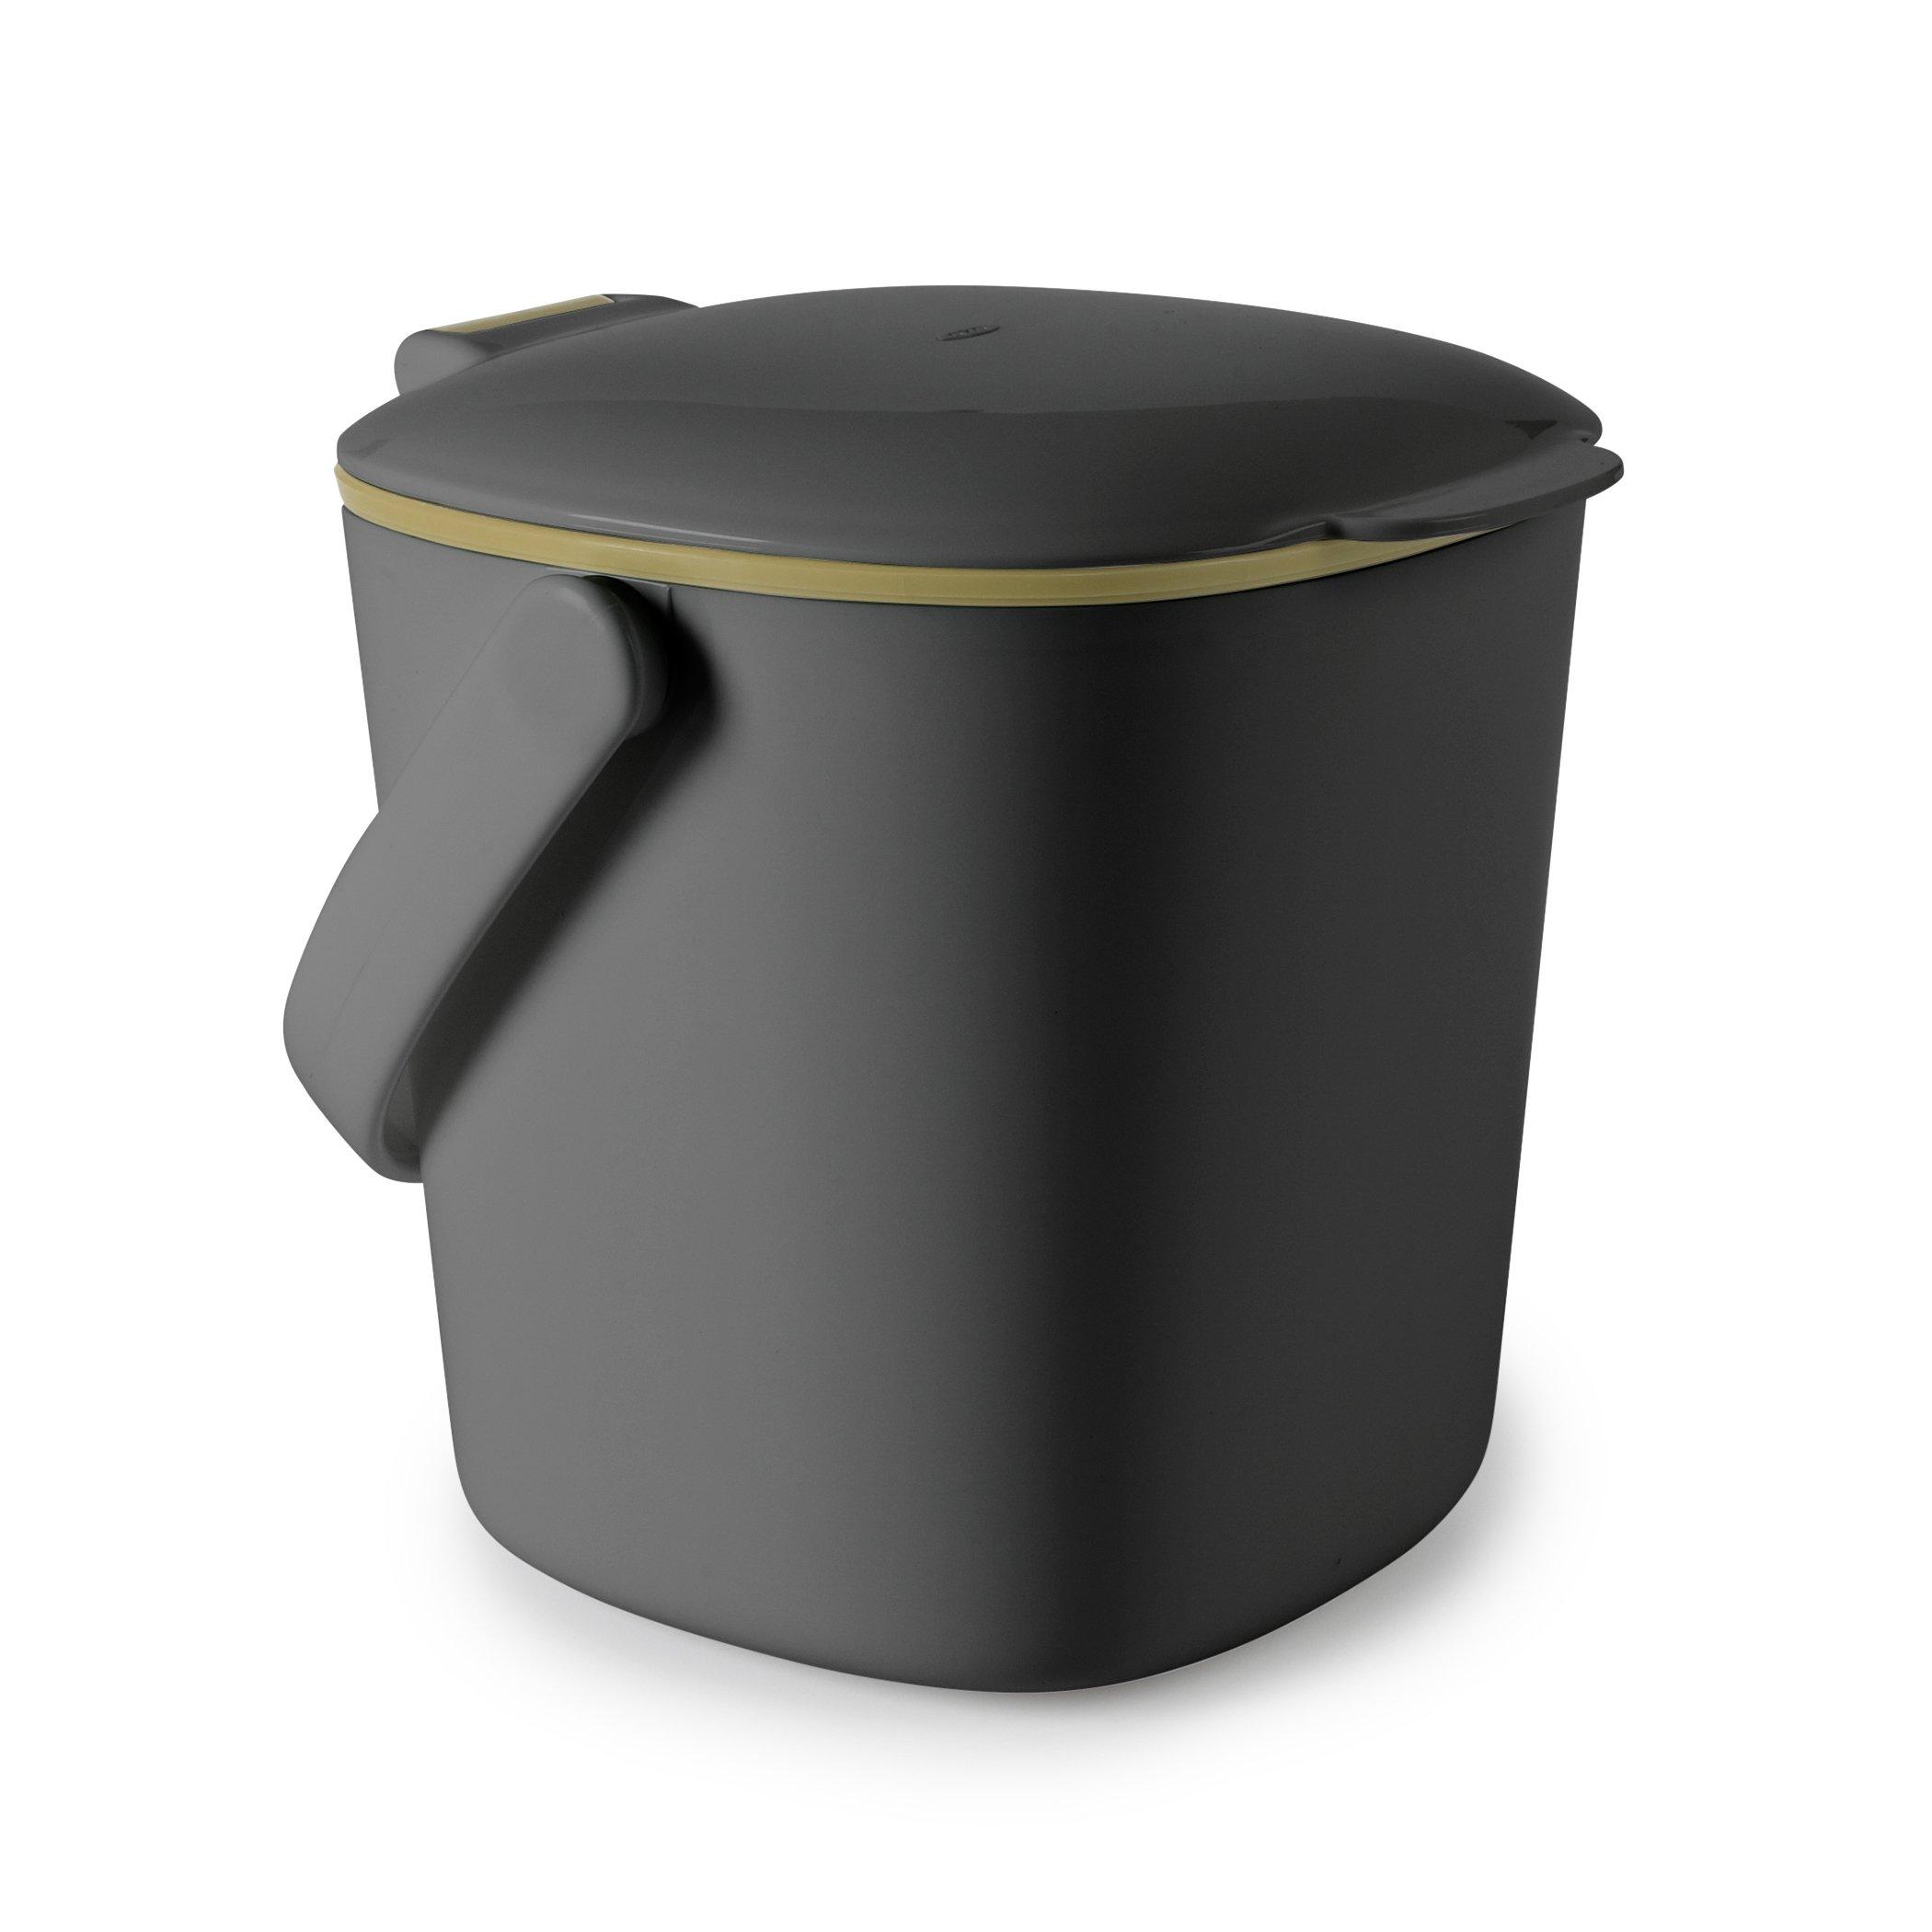 OXO Good Grips Küchenabfalleimer Komposteimer, Plastik, grau Küche ...